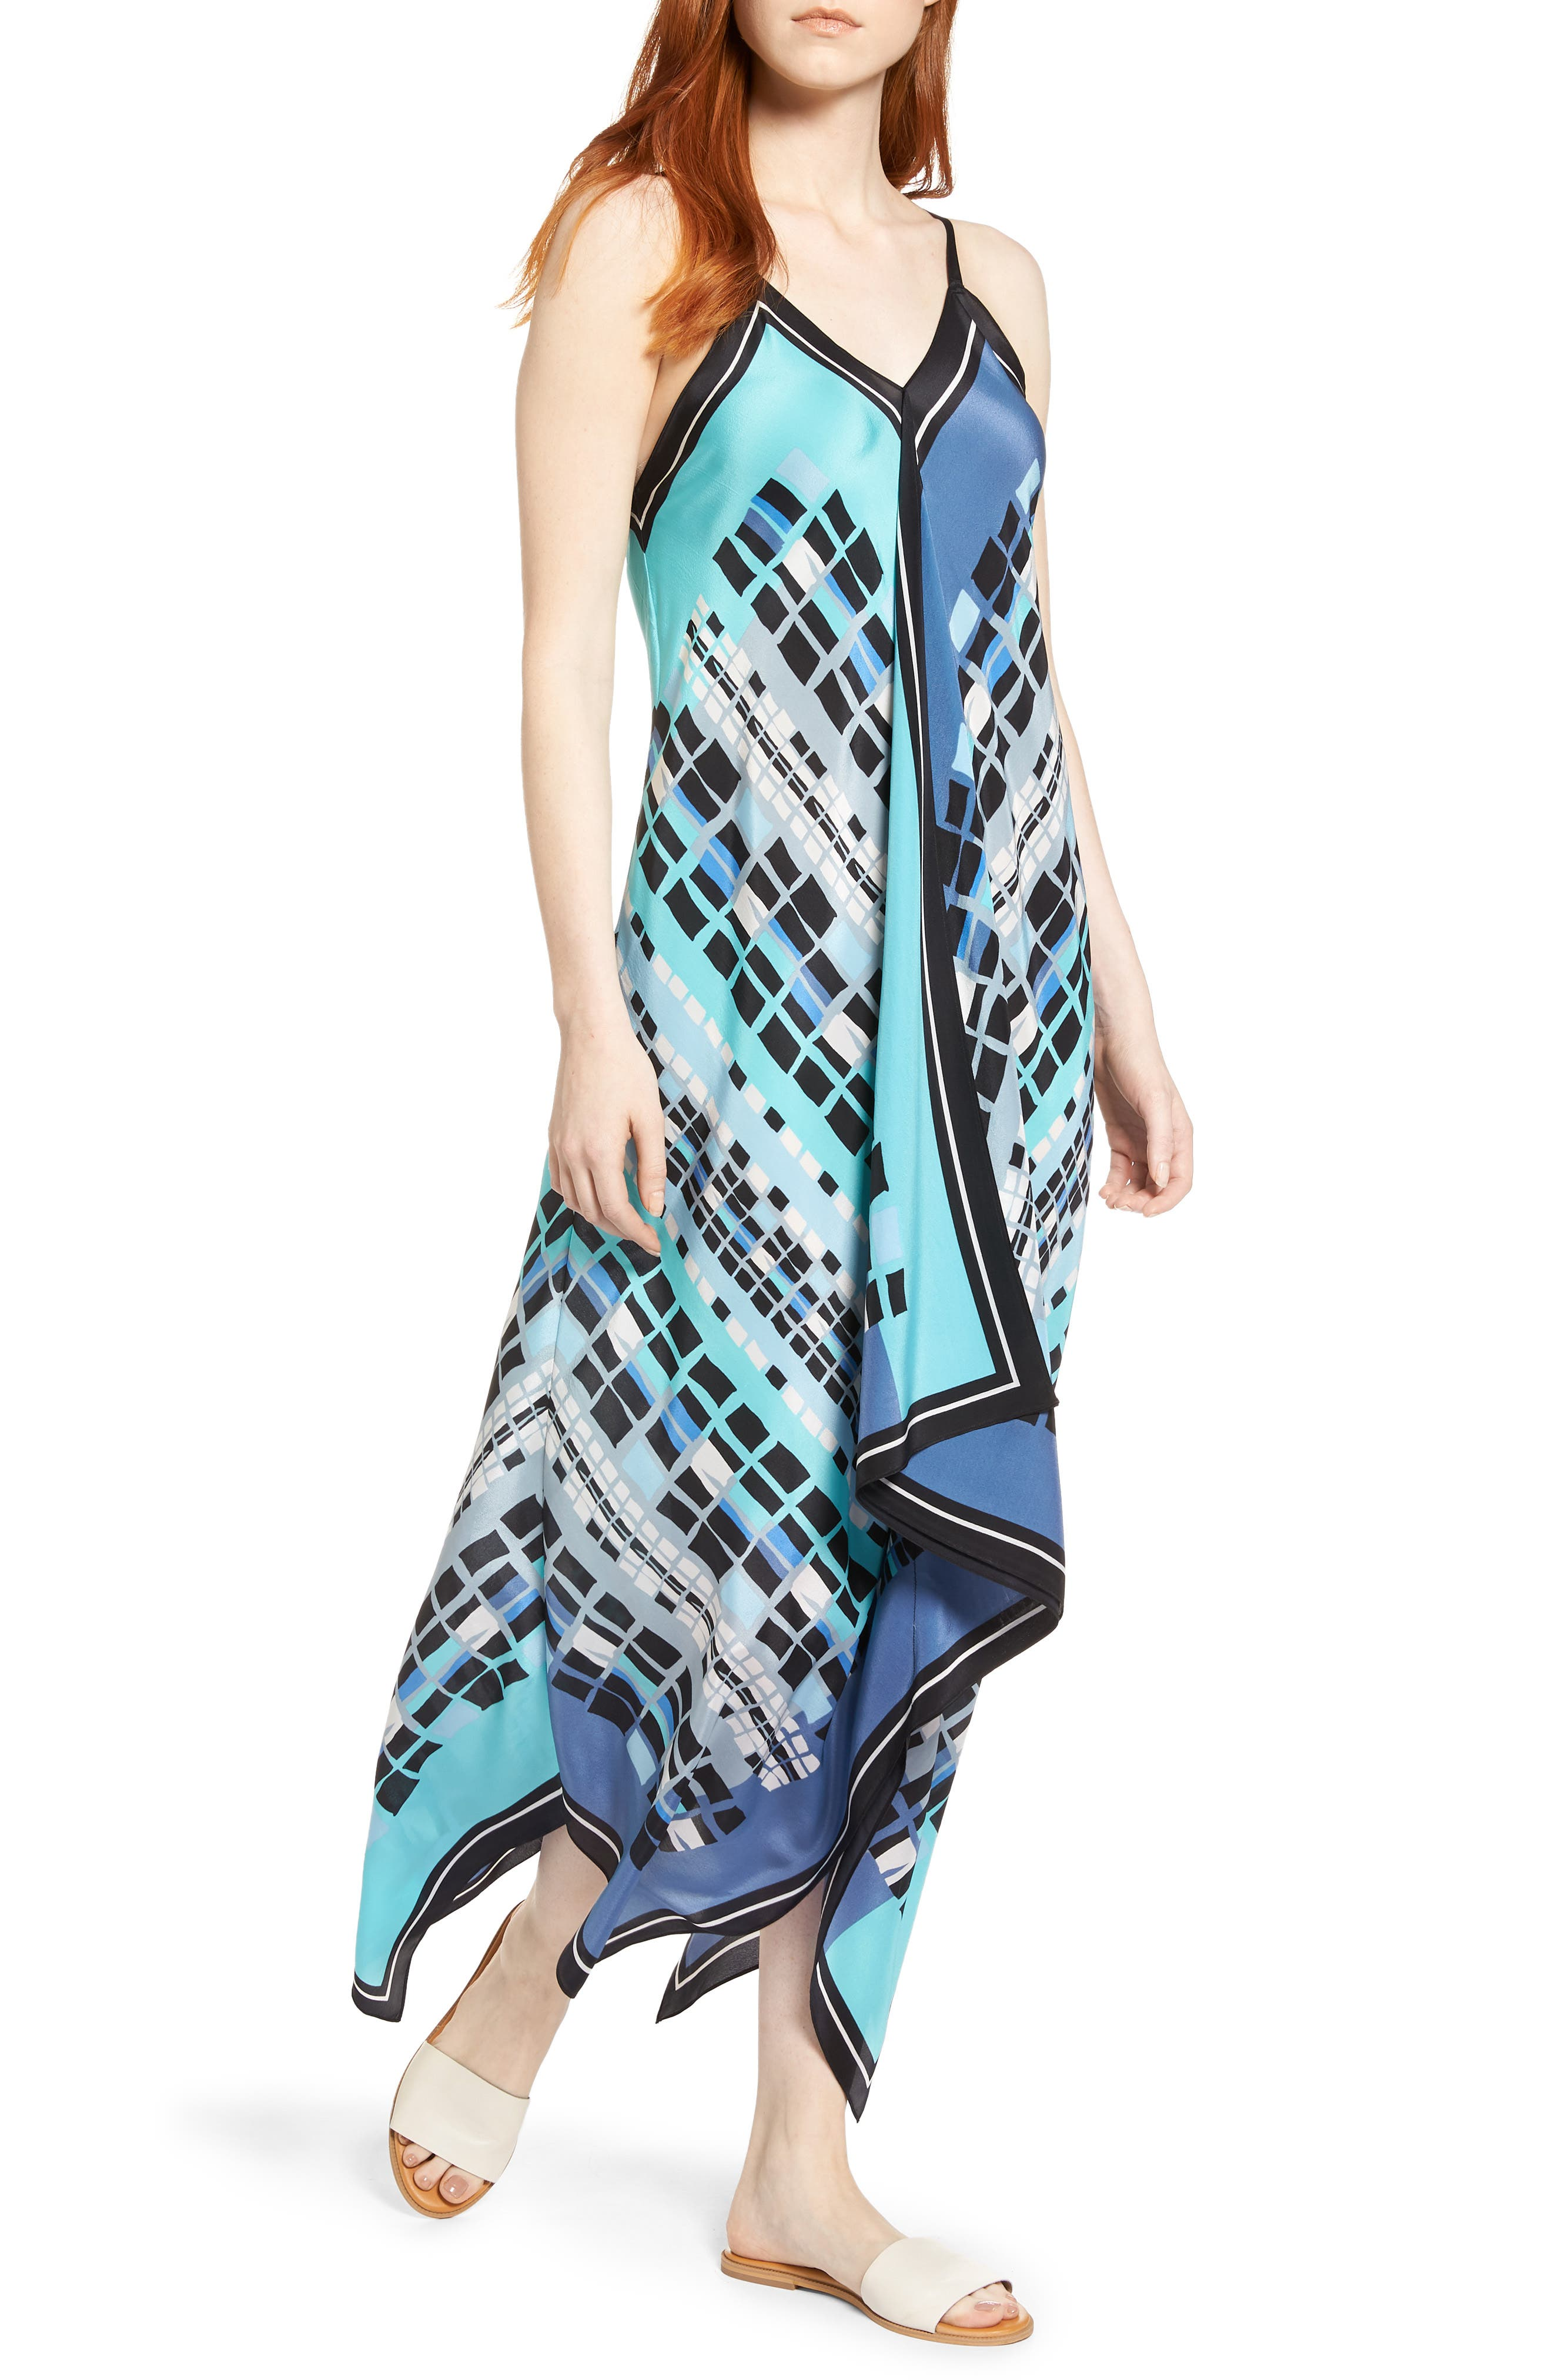 From Above Dress Silk Blend Maxi Dress,                         Main,                         color, 490